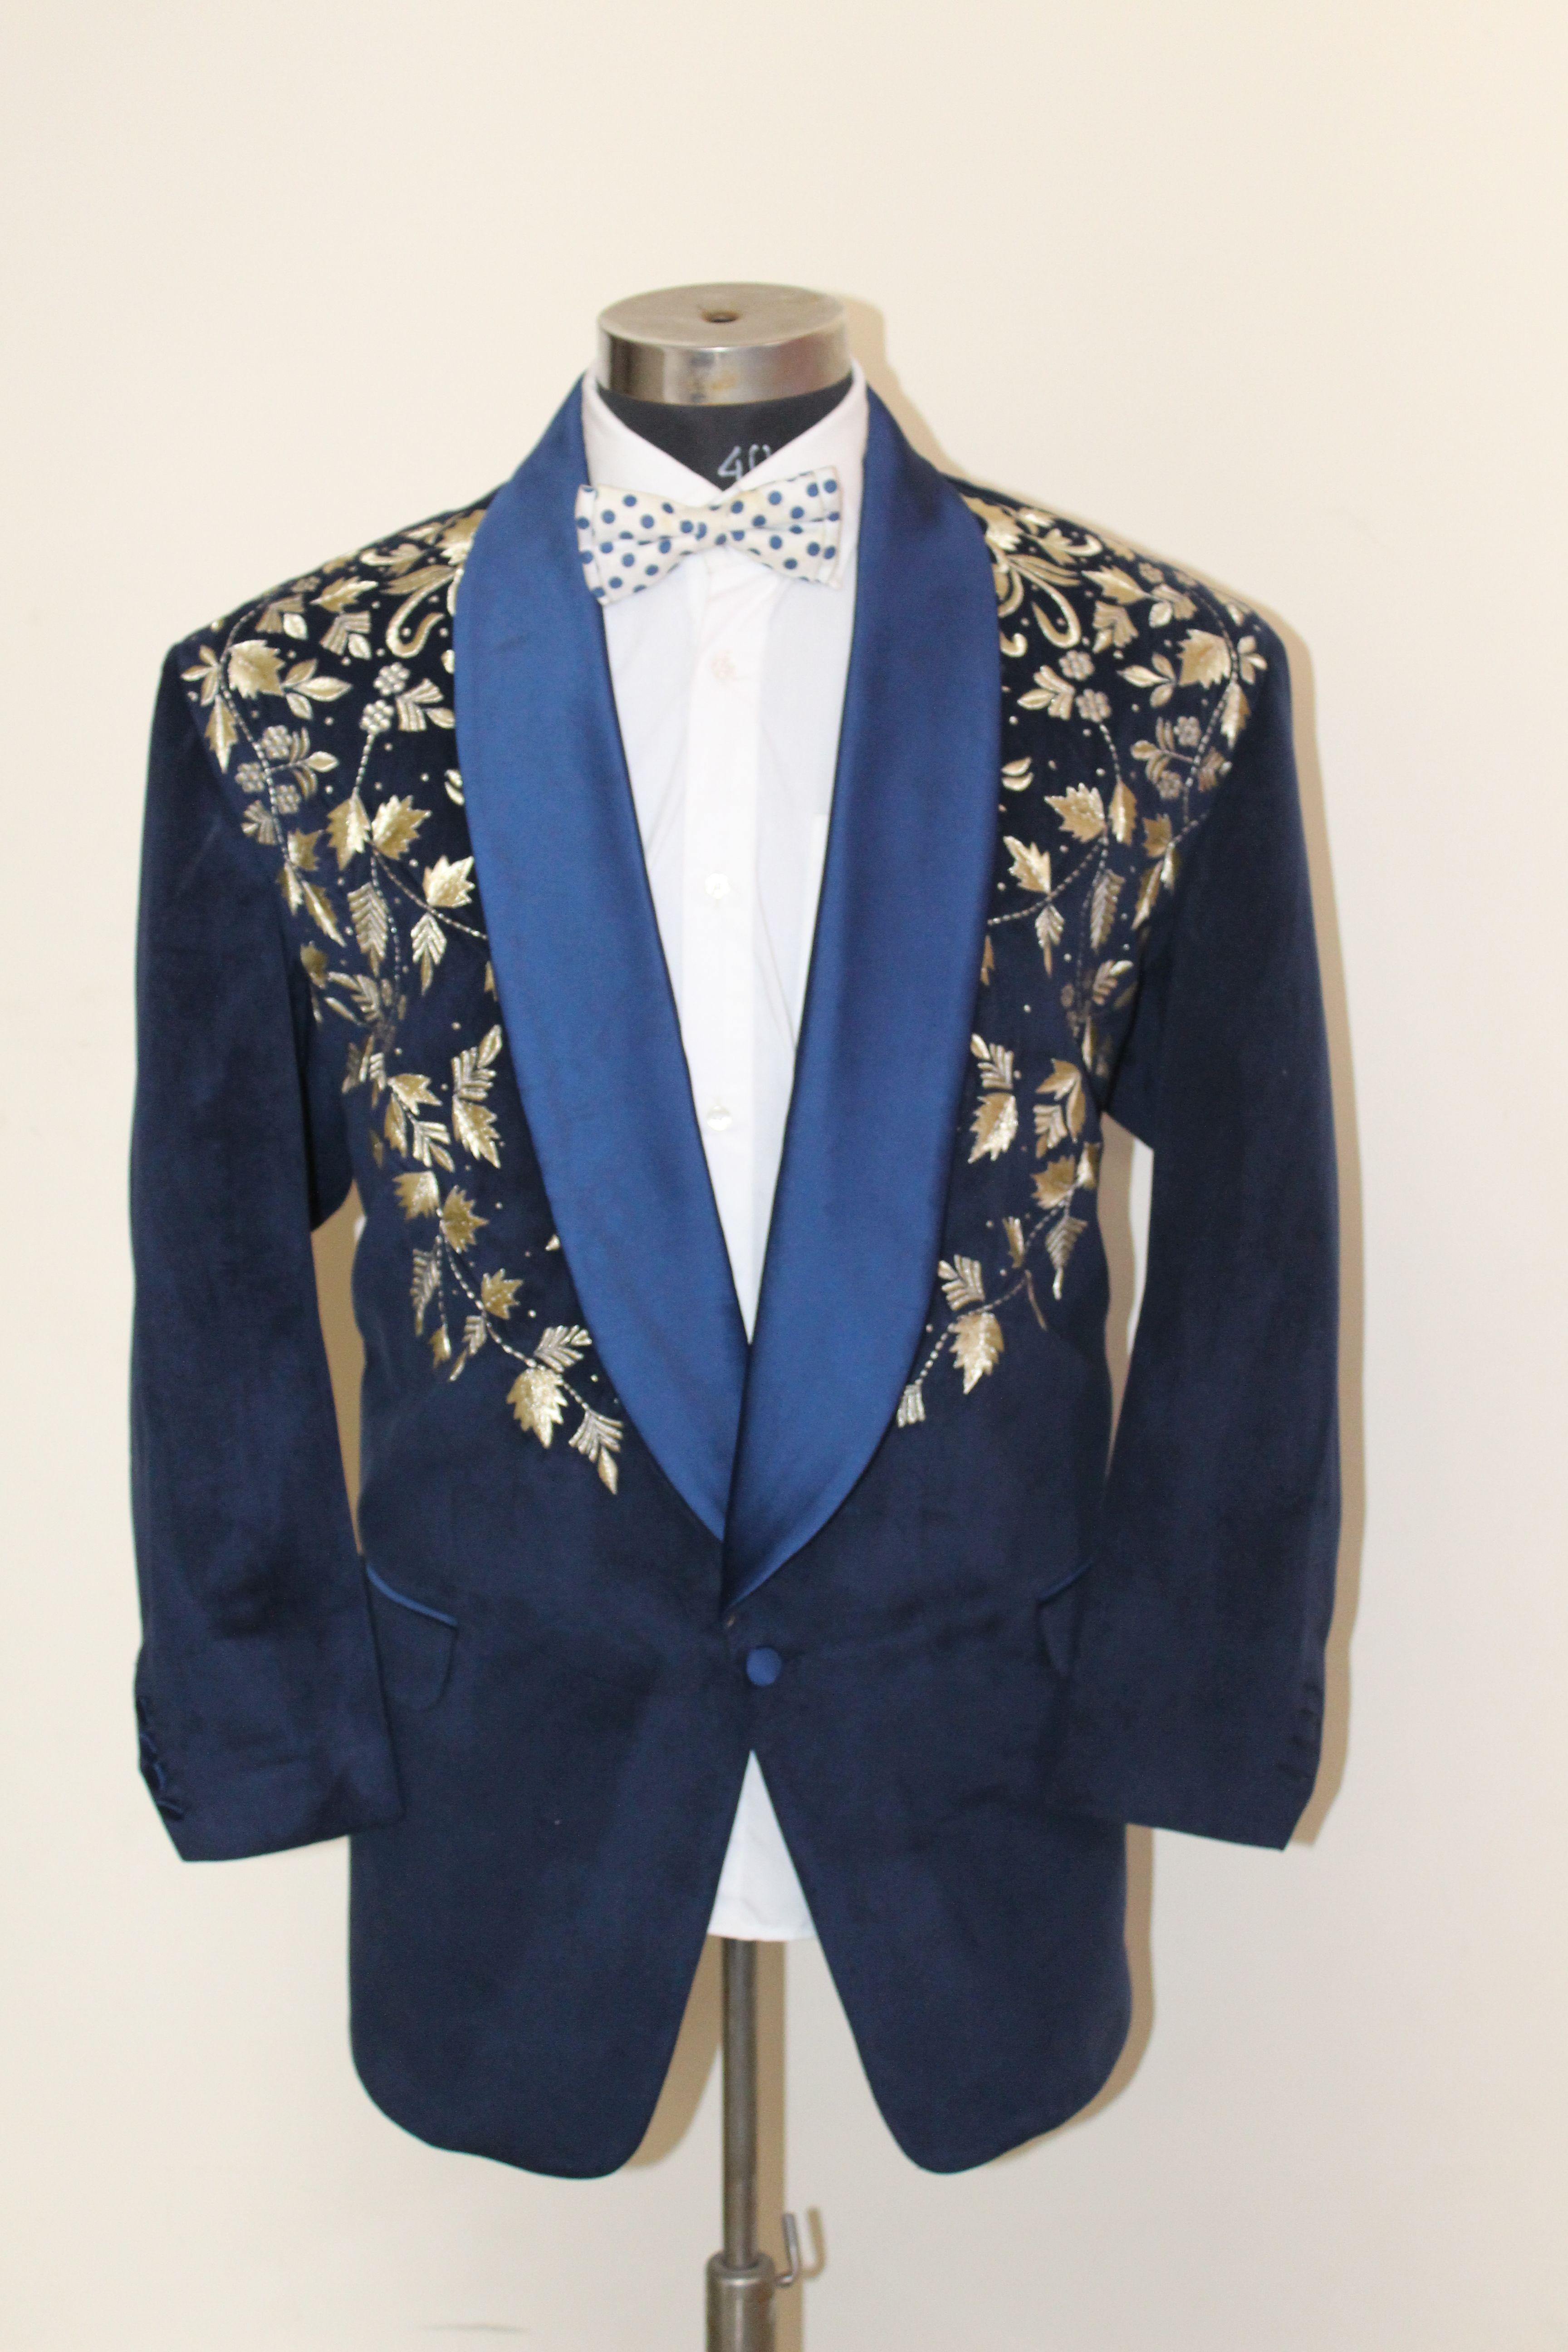 A Blue Fine Velvet Tuxedo Jacket with Gold Work ...